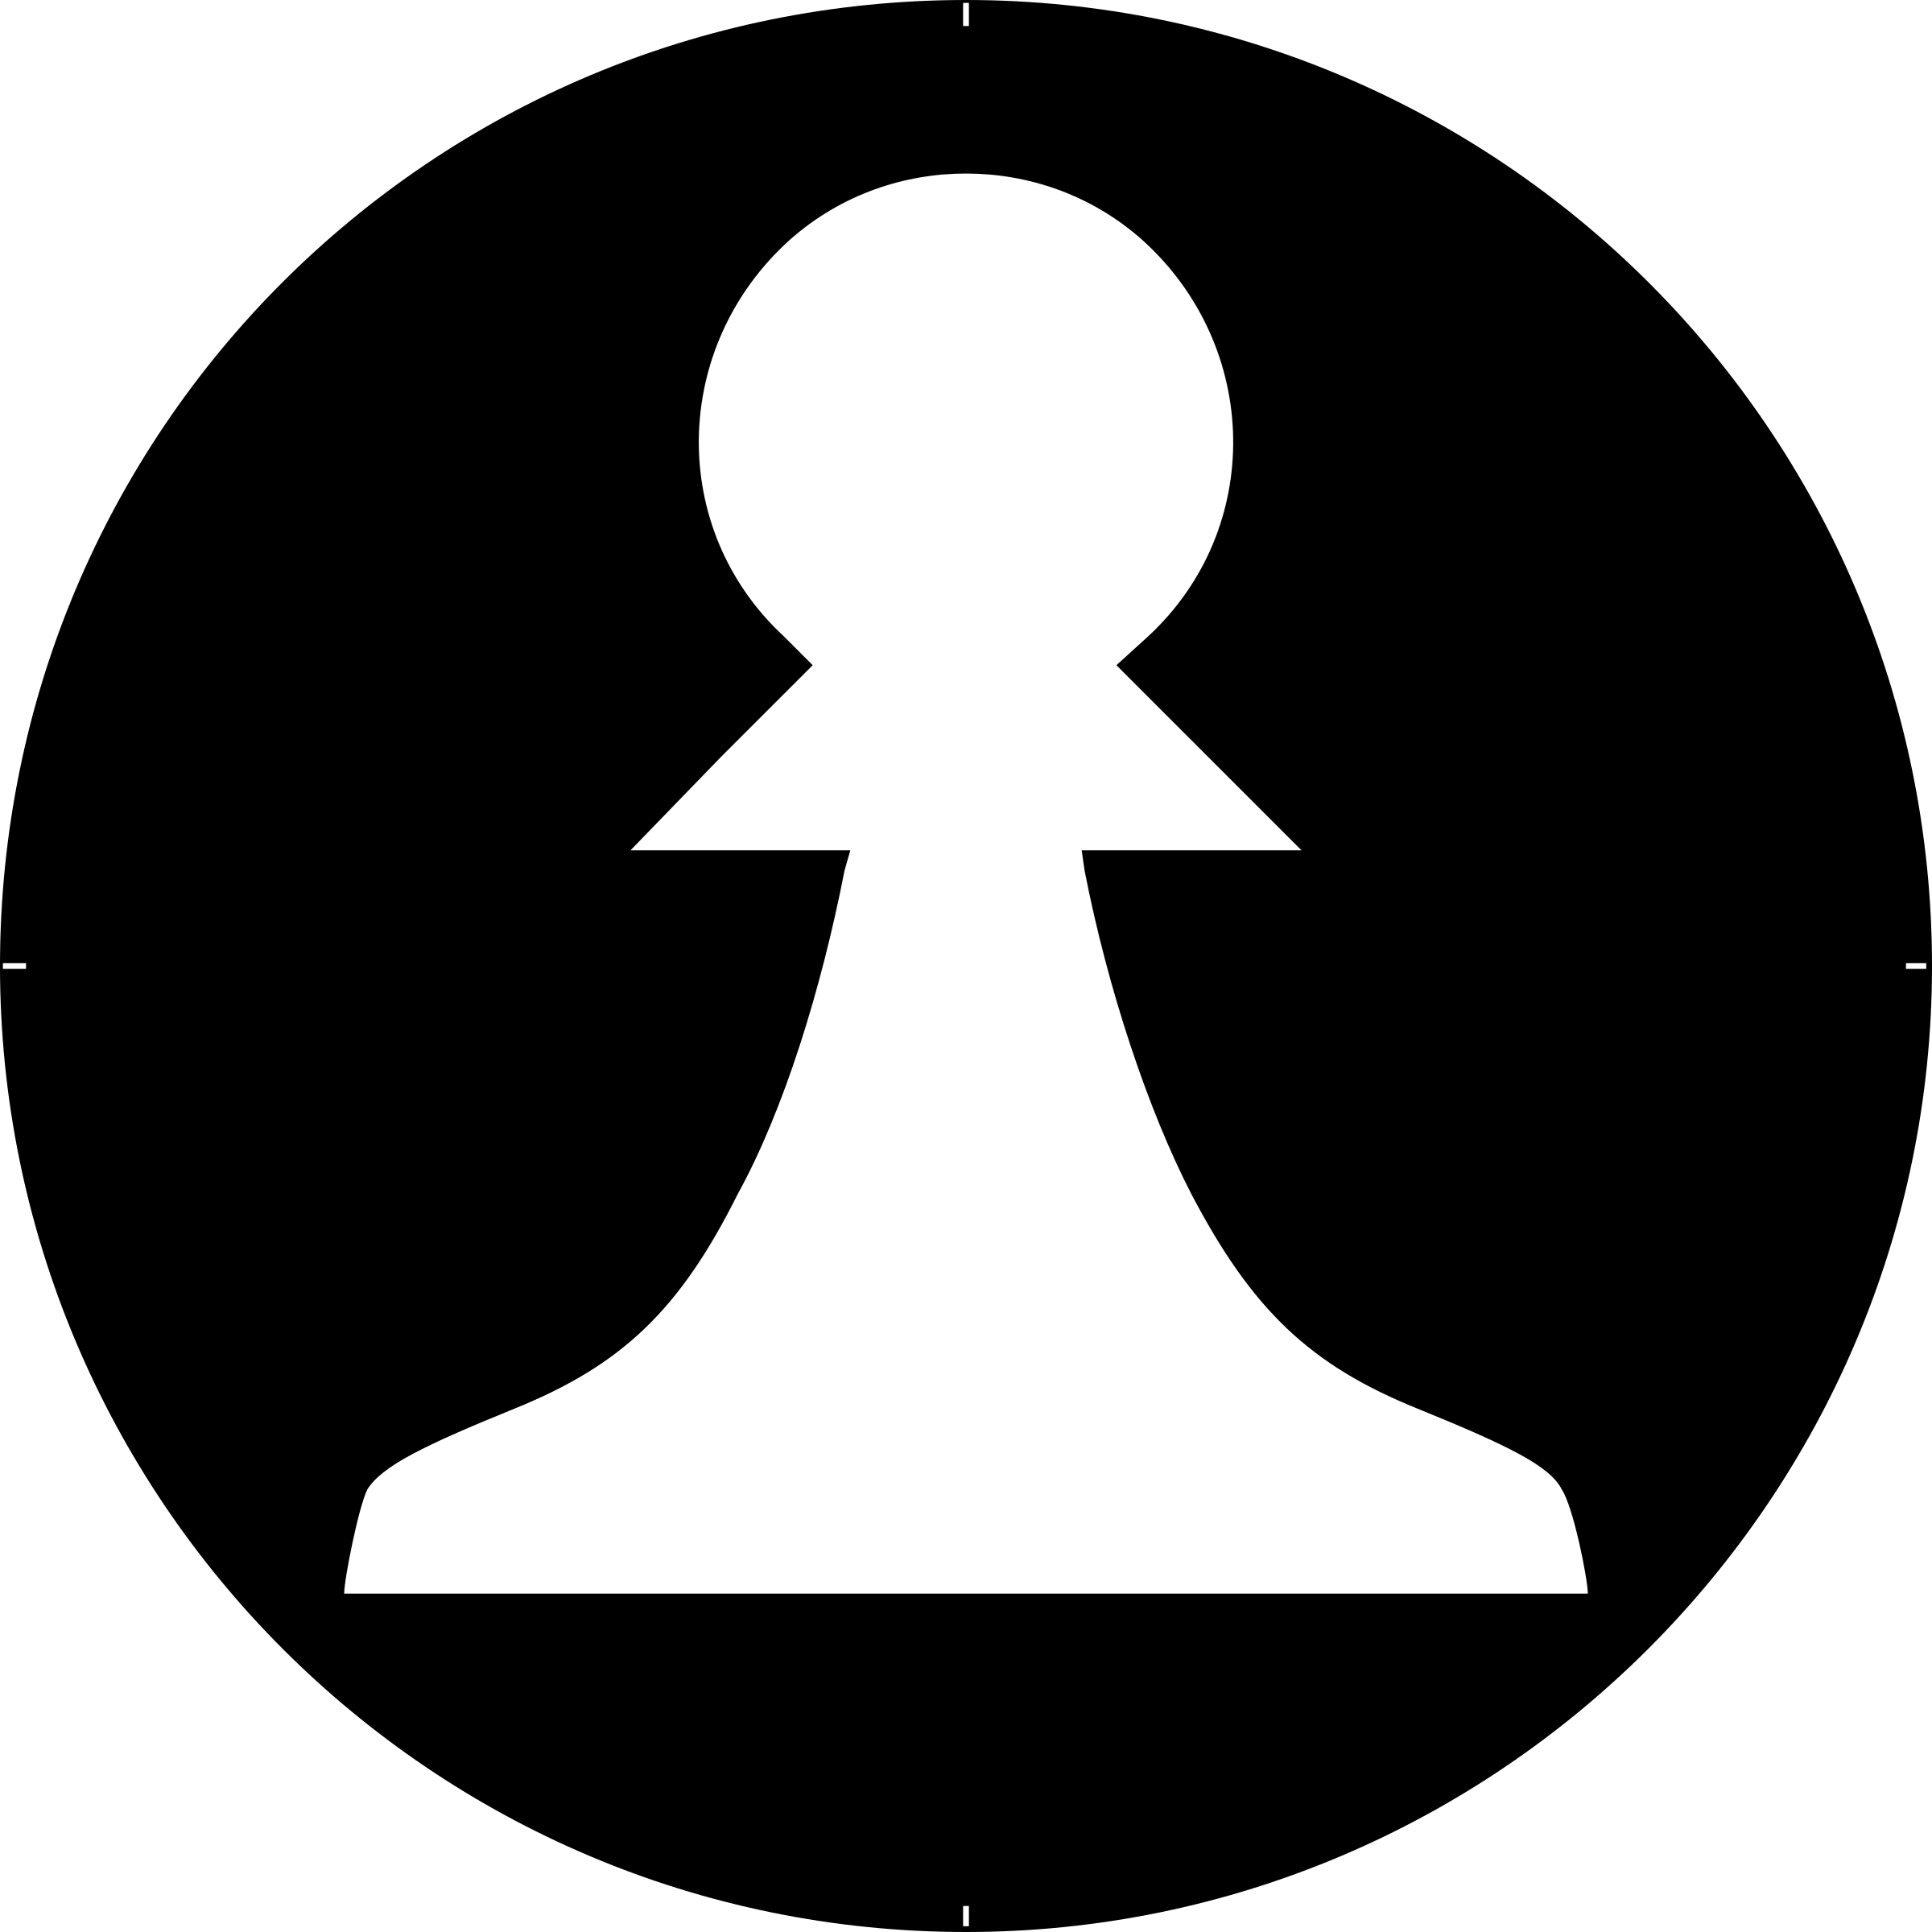 Clipart - Chess Piece Symbol – White Pawn – Peón Blanco